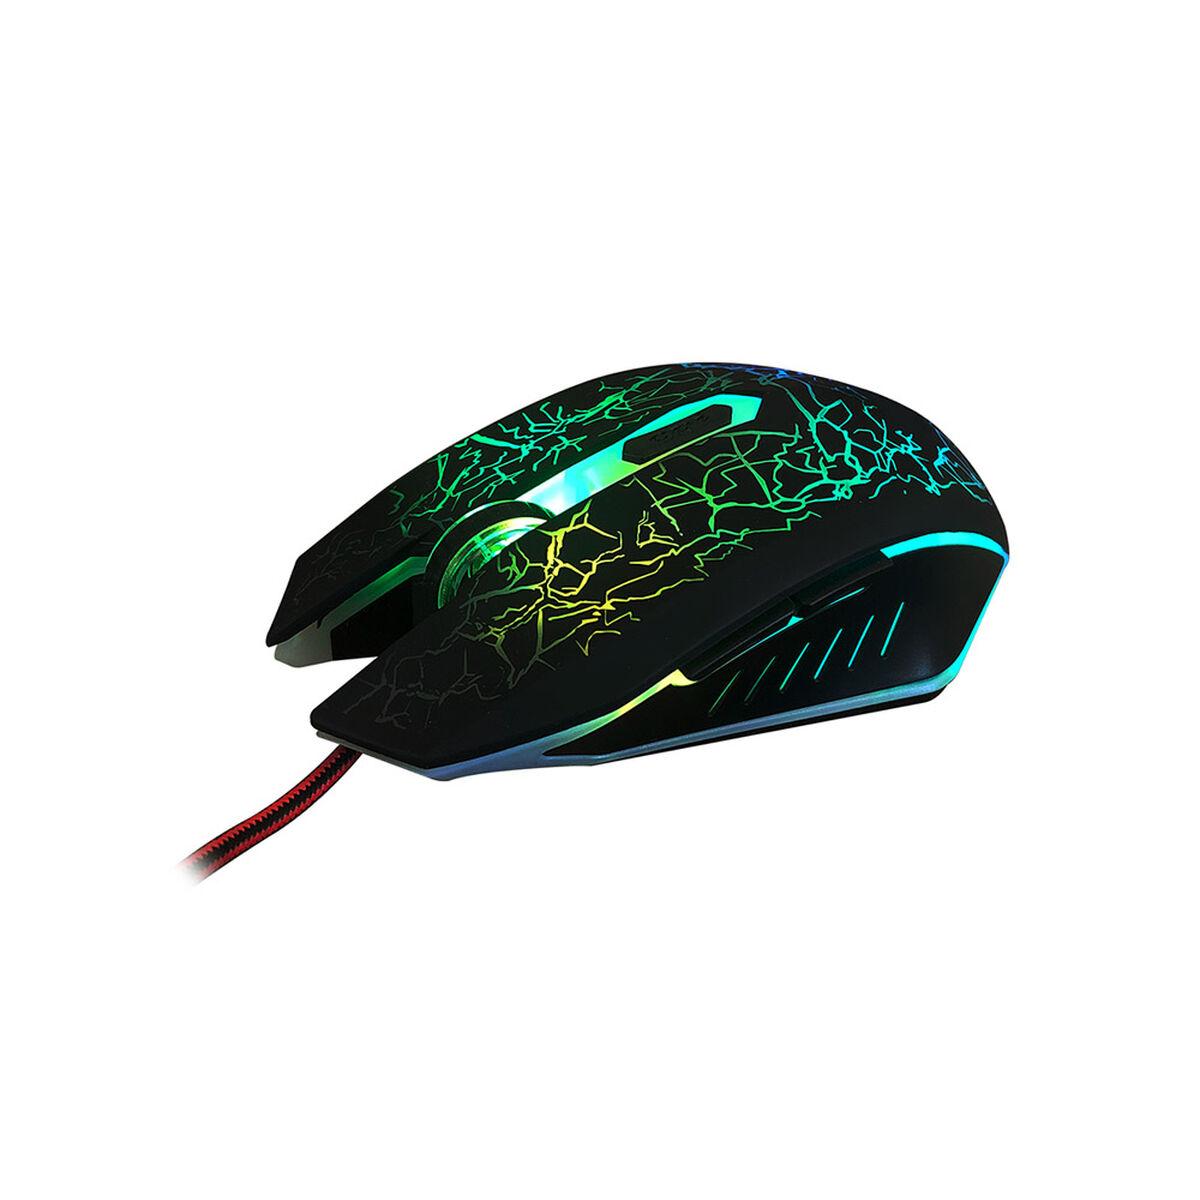 Combo Gamer Urbano 3-1 Mouse + MousePad + Teclado